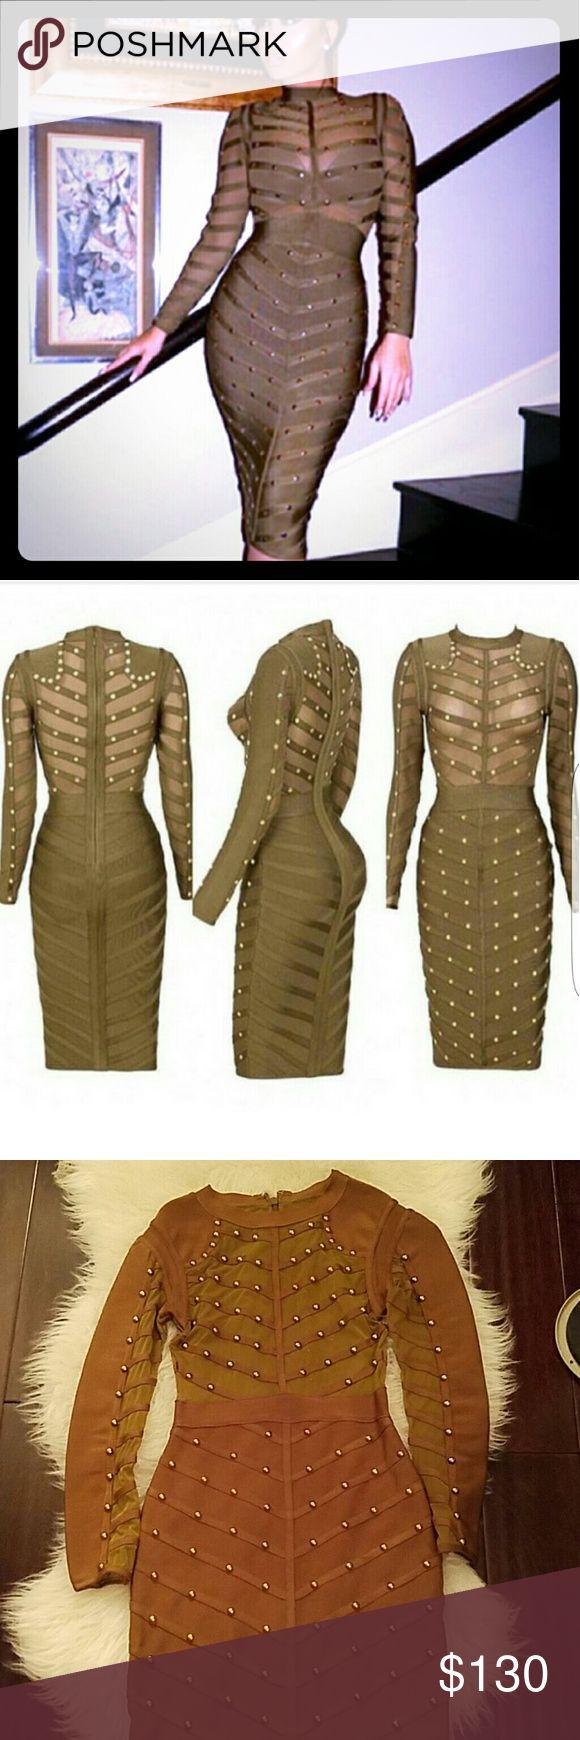 Olive green bandage dress Bandage dress / Worn once Dresses